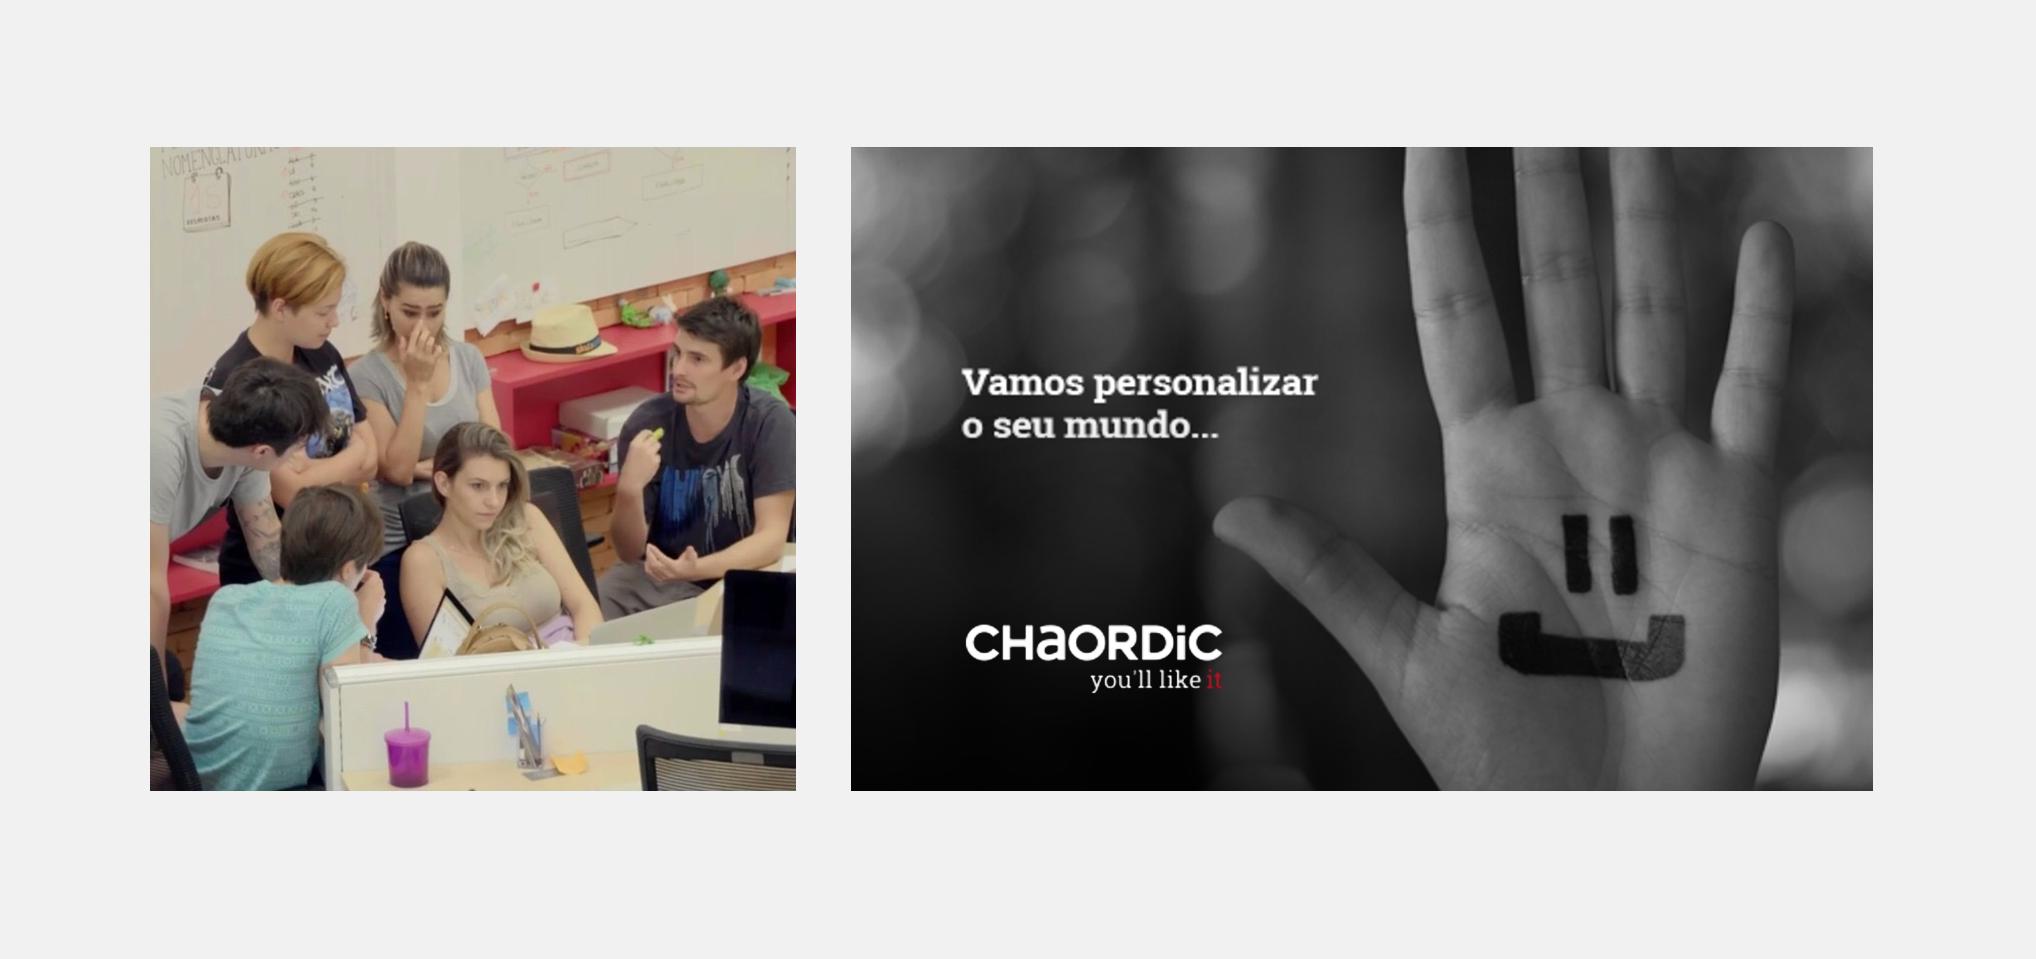 thumb_chaordic2